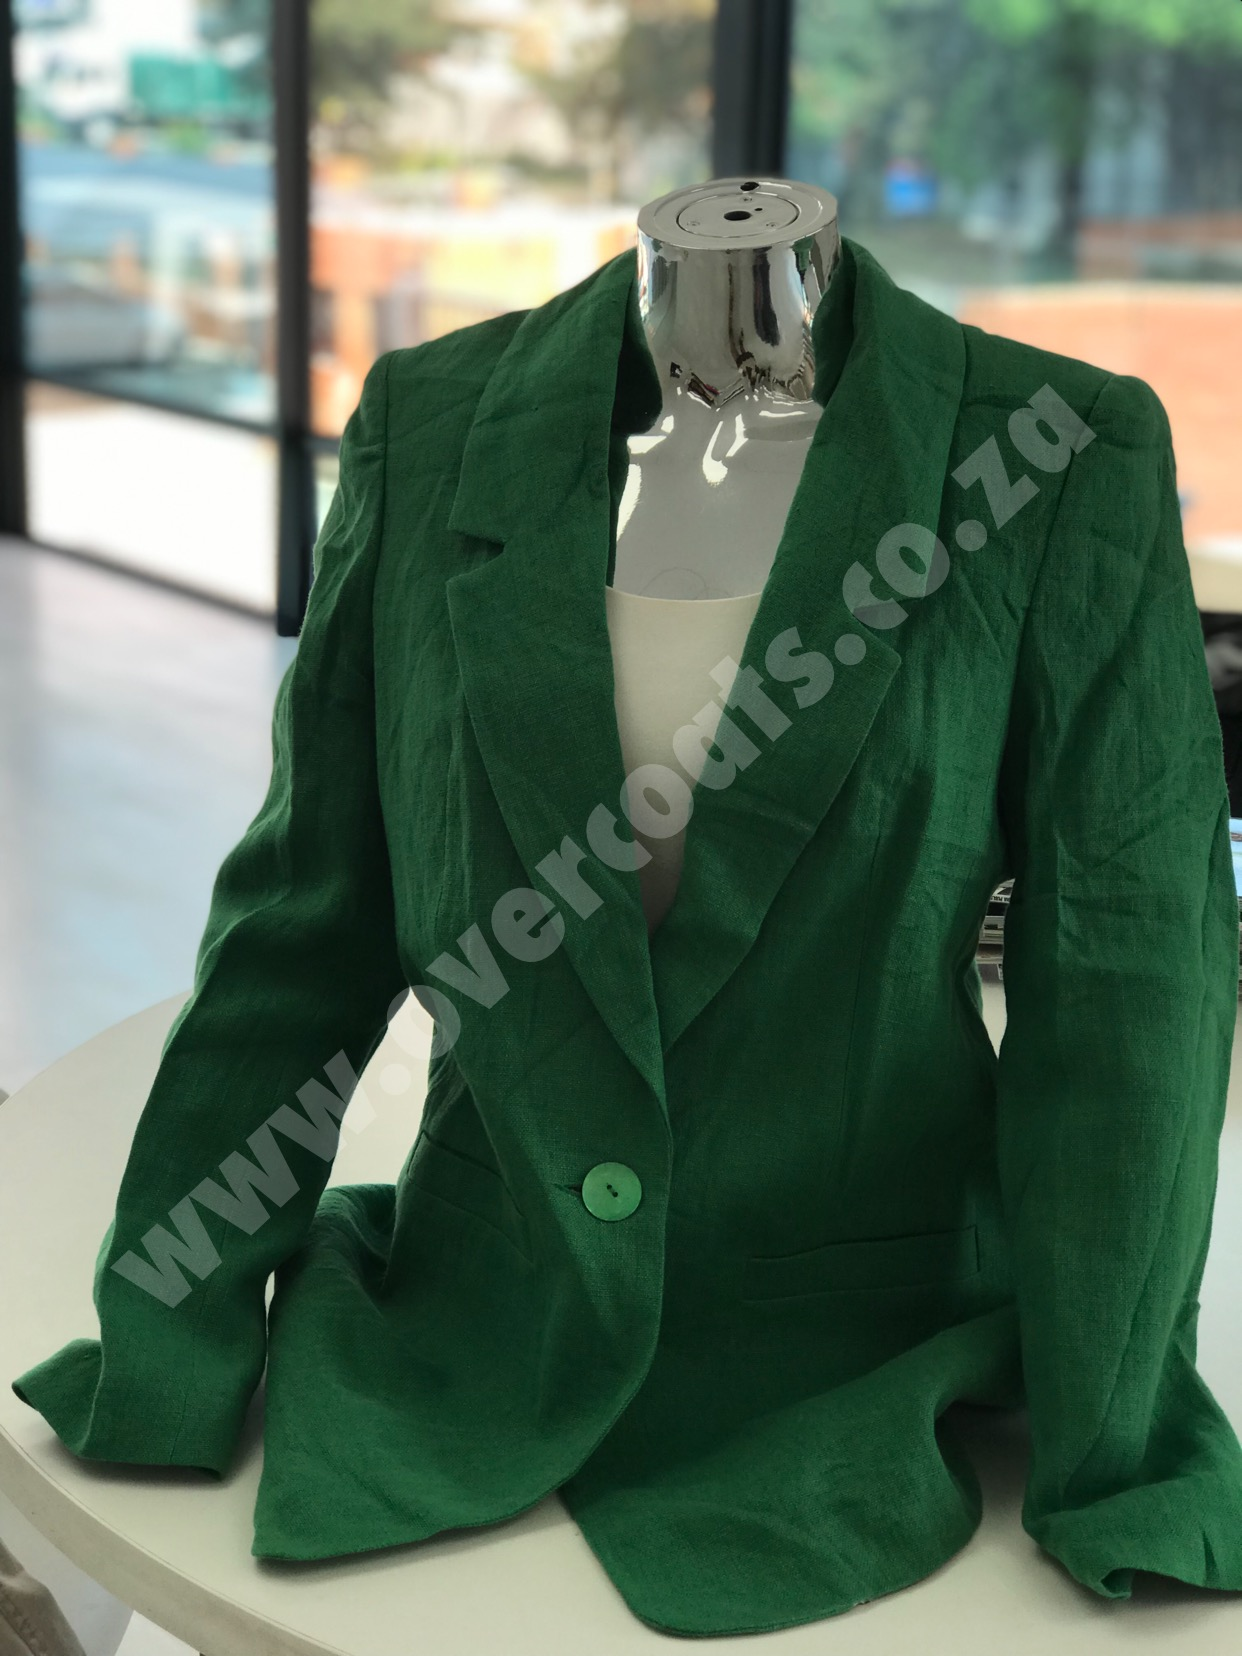 Save R540 - Buy the Scottish Mix (ladies jackets) bale!